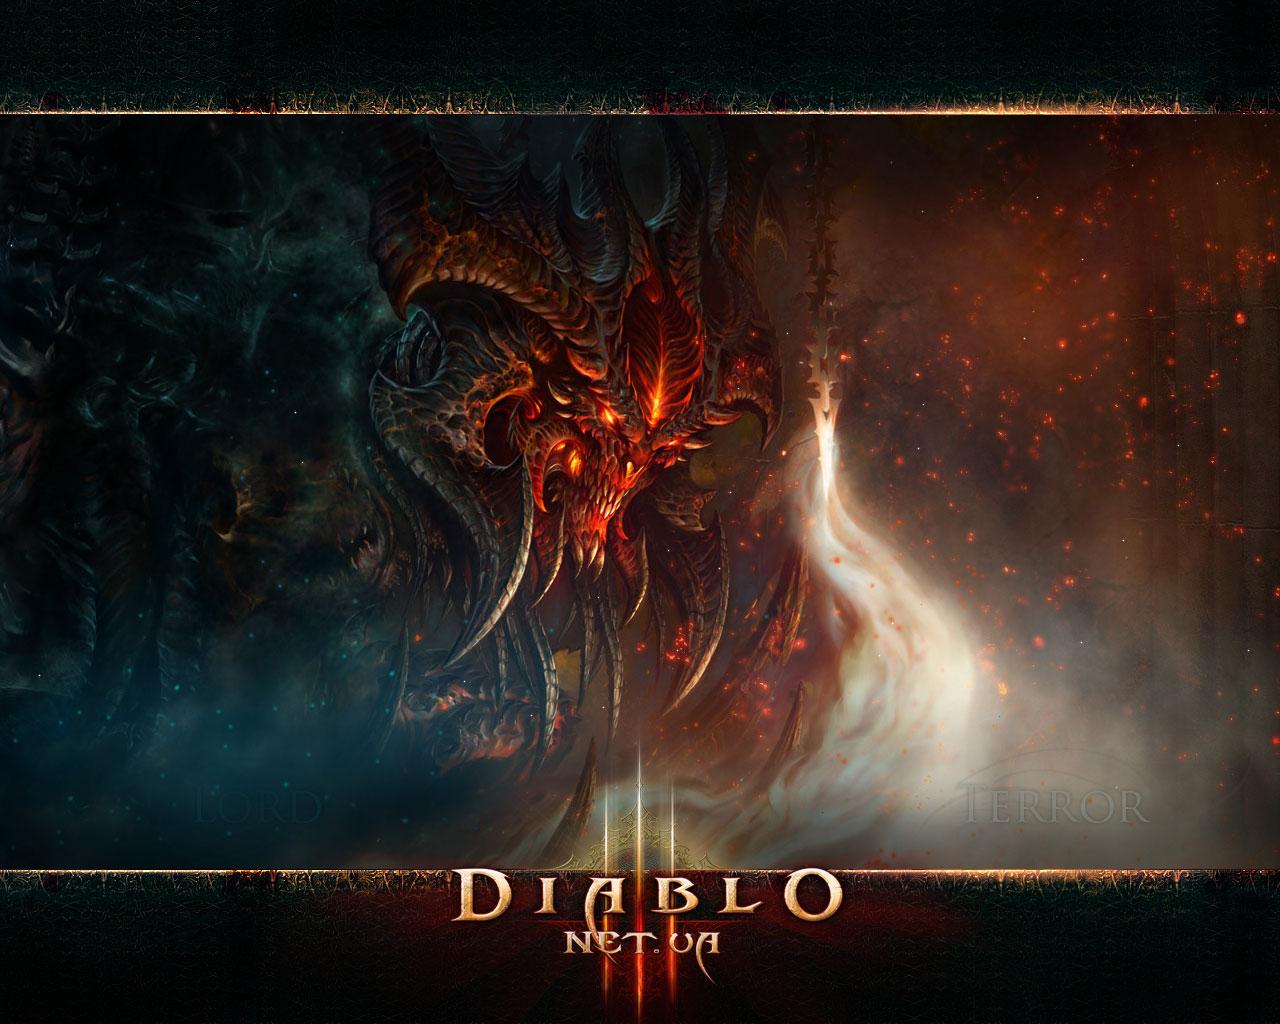 http://3.bp.blogspot.com/-jAiveZIQK_0/T9qK8TZNkhI/AAAAAAAAAYU/zGu0SnYxhPI/s1600/Diablo-3-Wallpaper-18.jpg